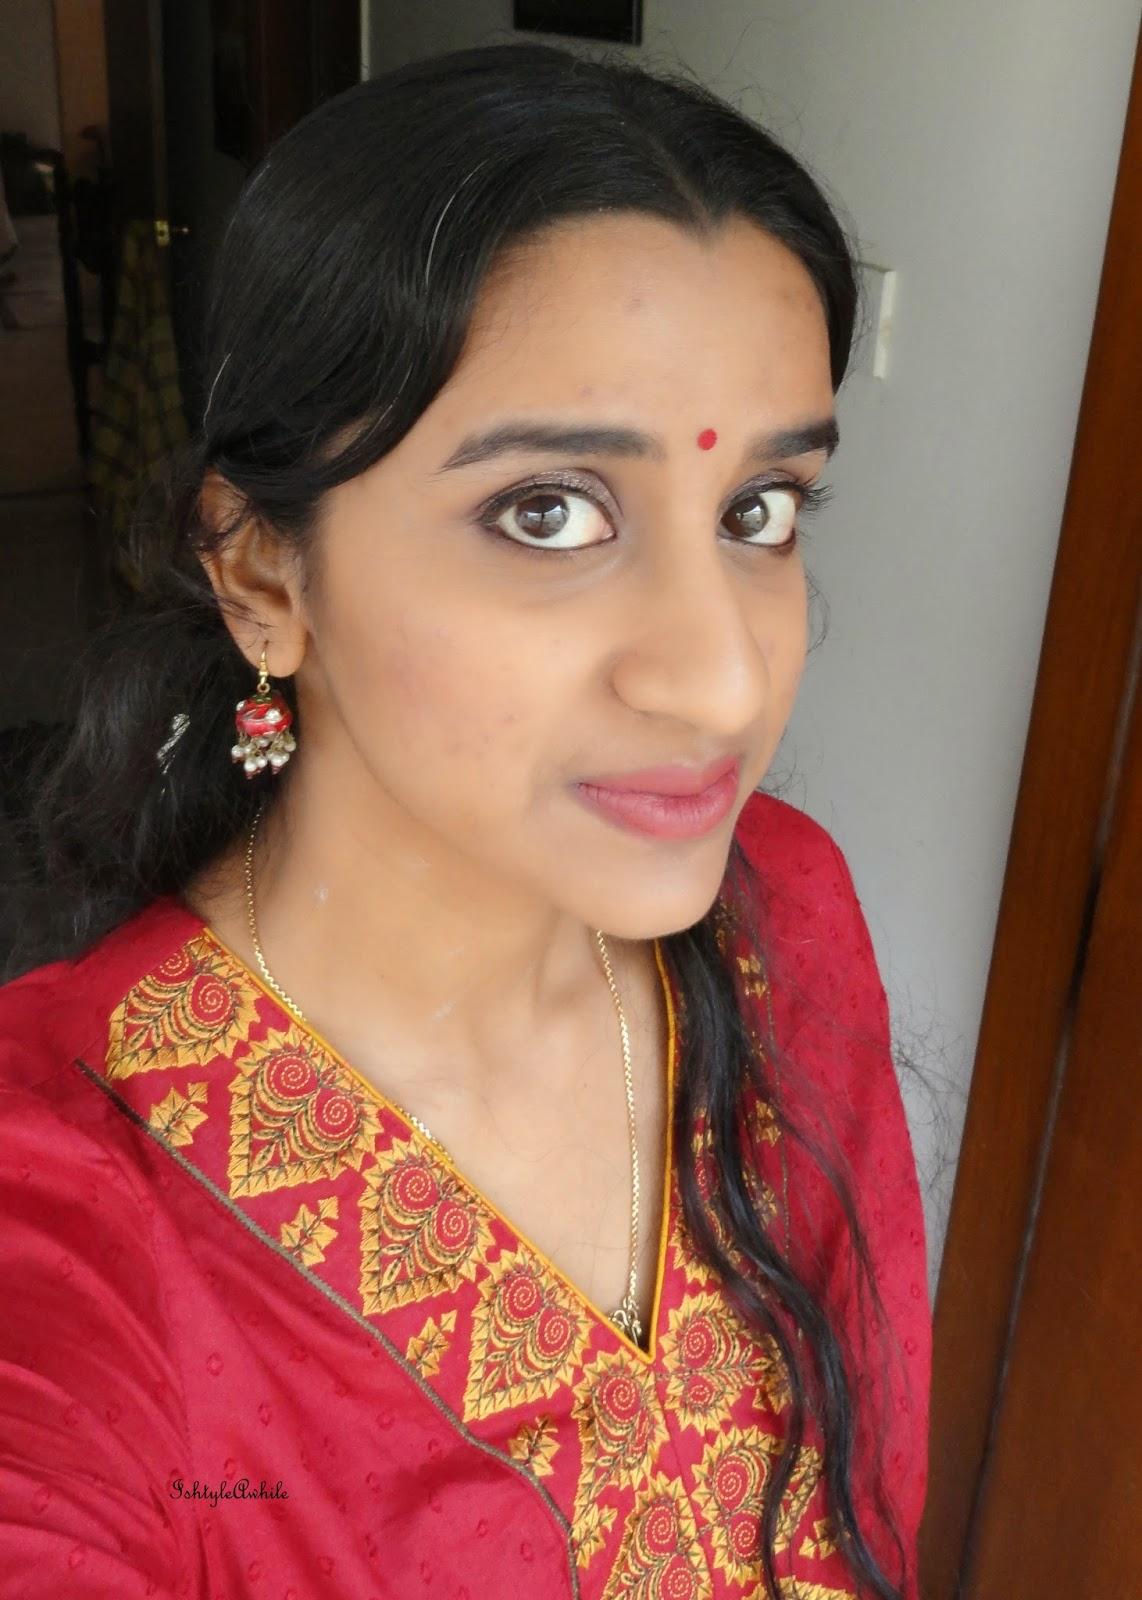 OOTD and LOTD: Varalakshmi puja special image